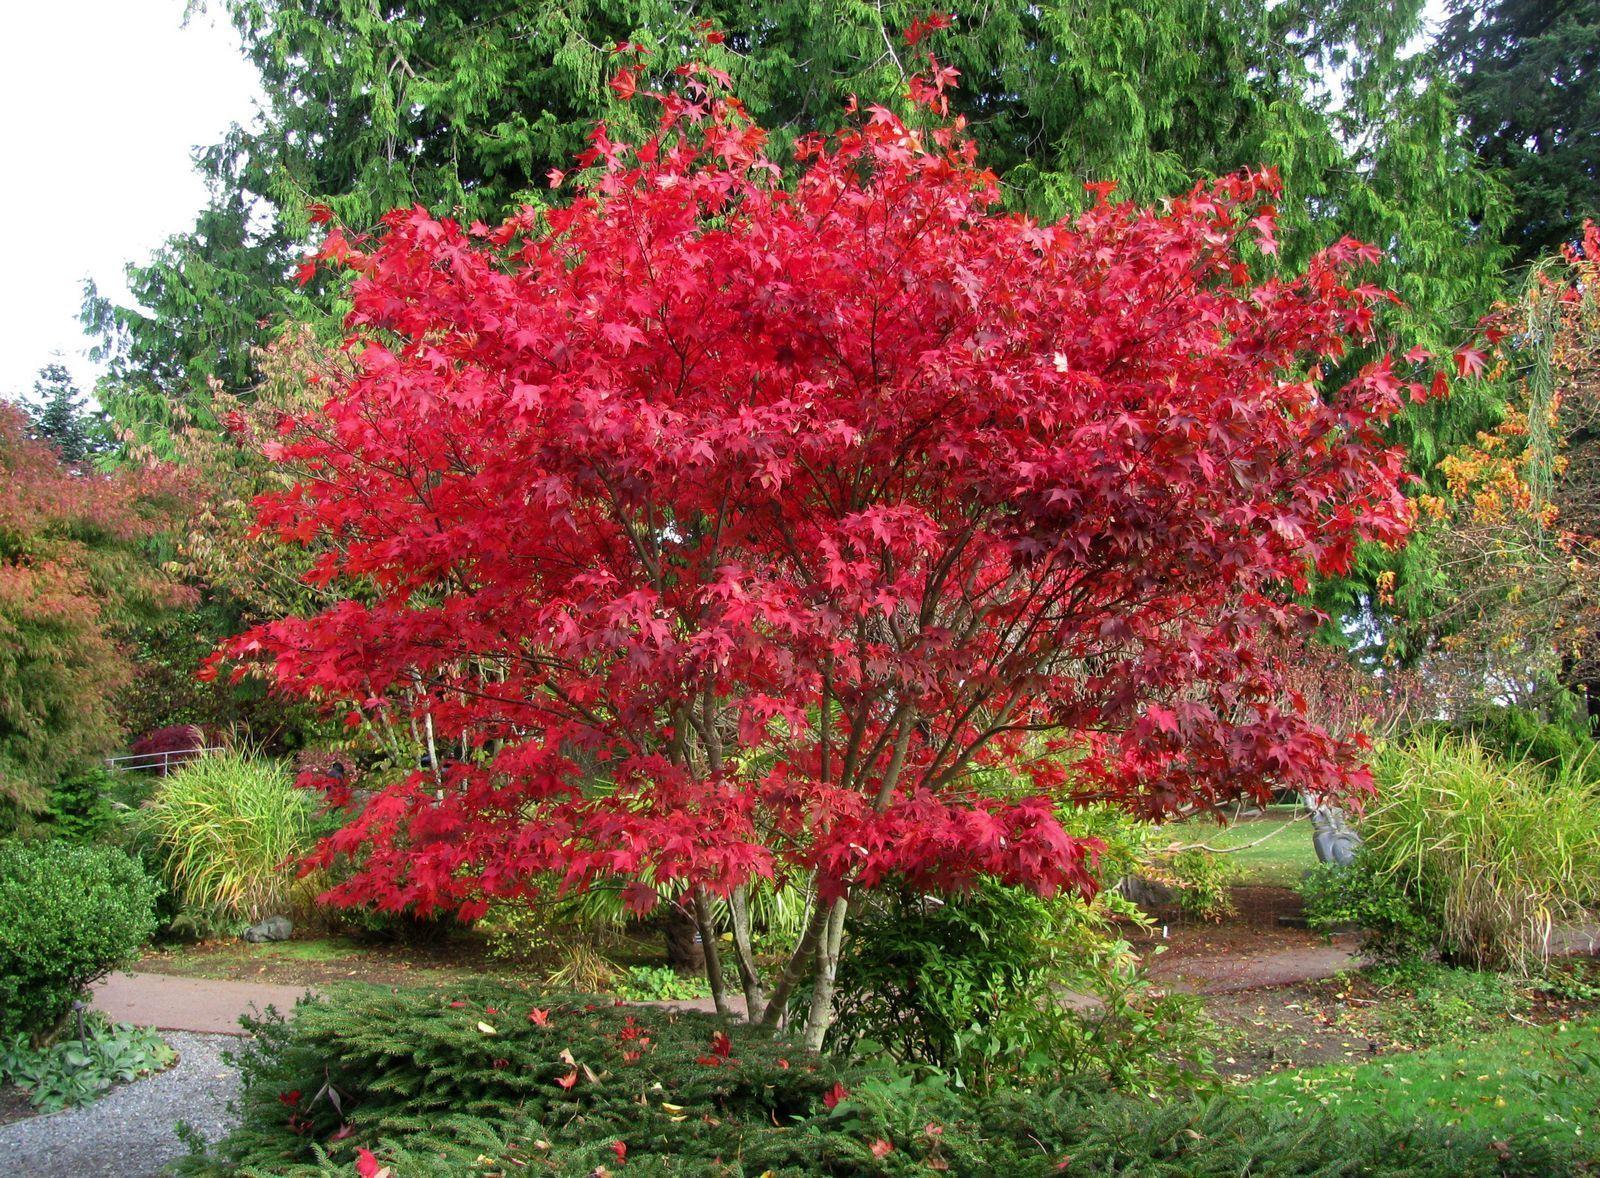 How to care for a fern leaf japanese maple - Boskoop Glory Japanese Maple Sun Tolerant Deer Resistant